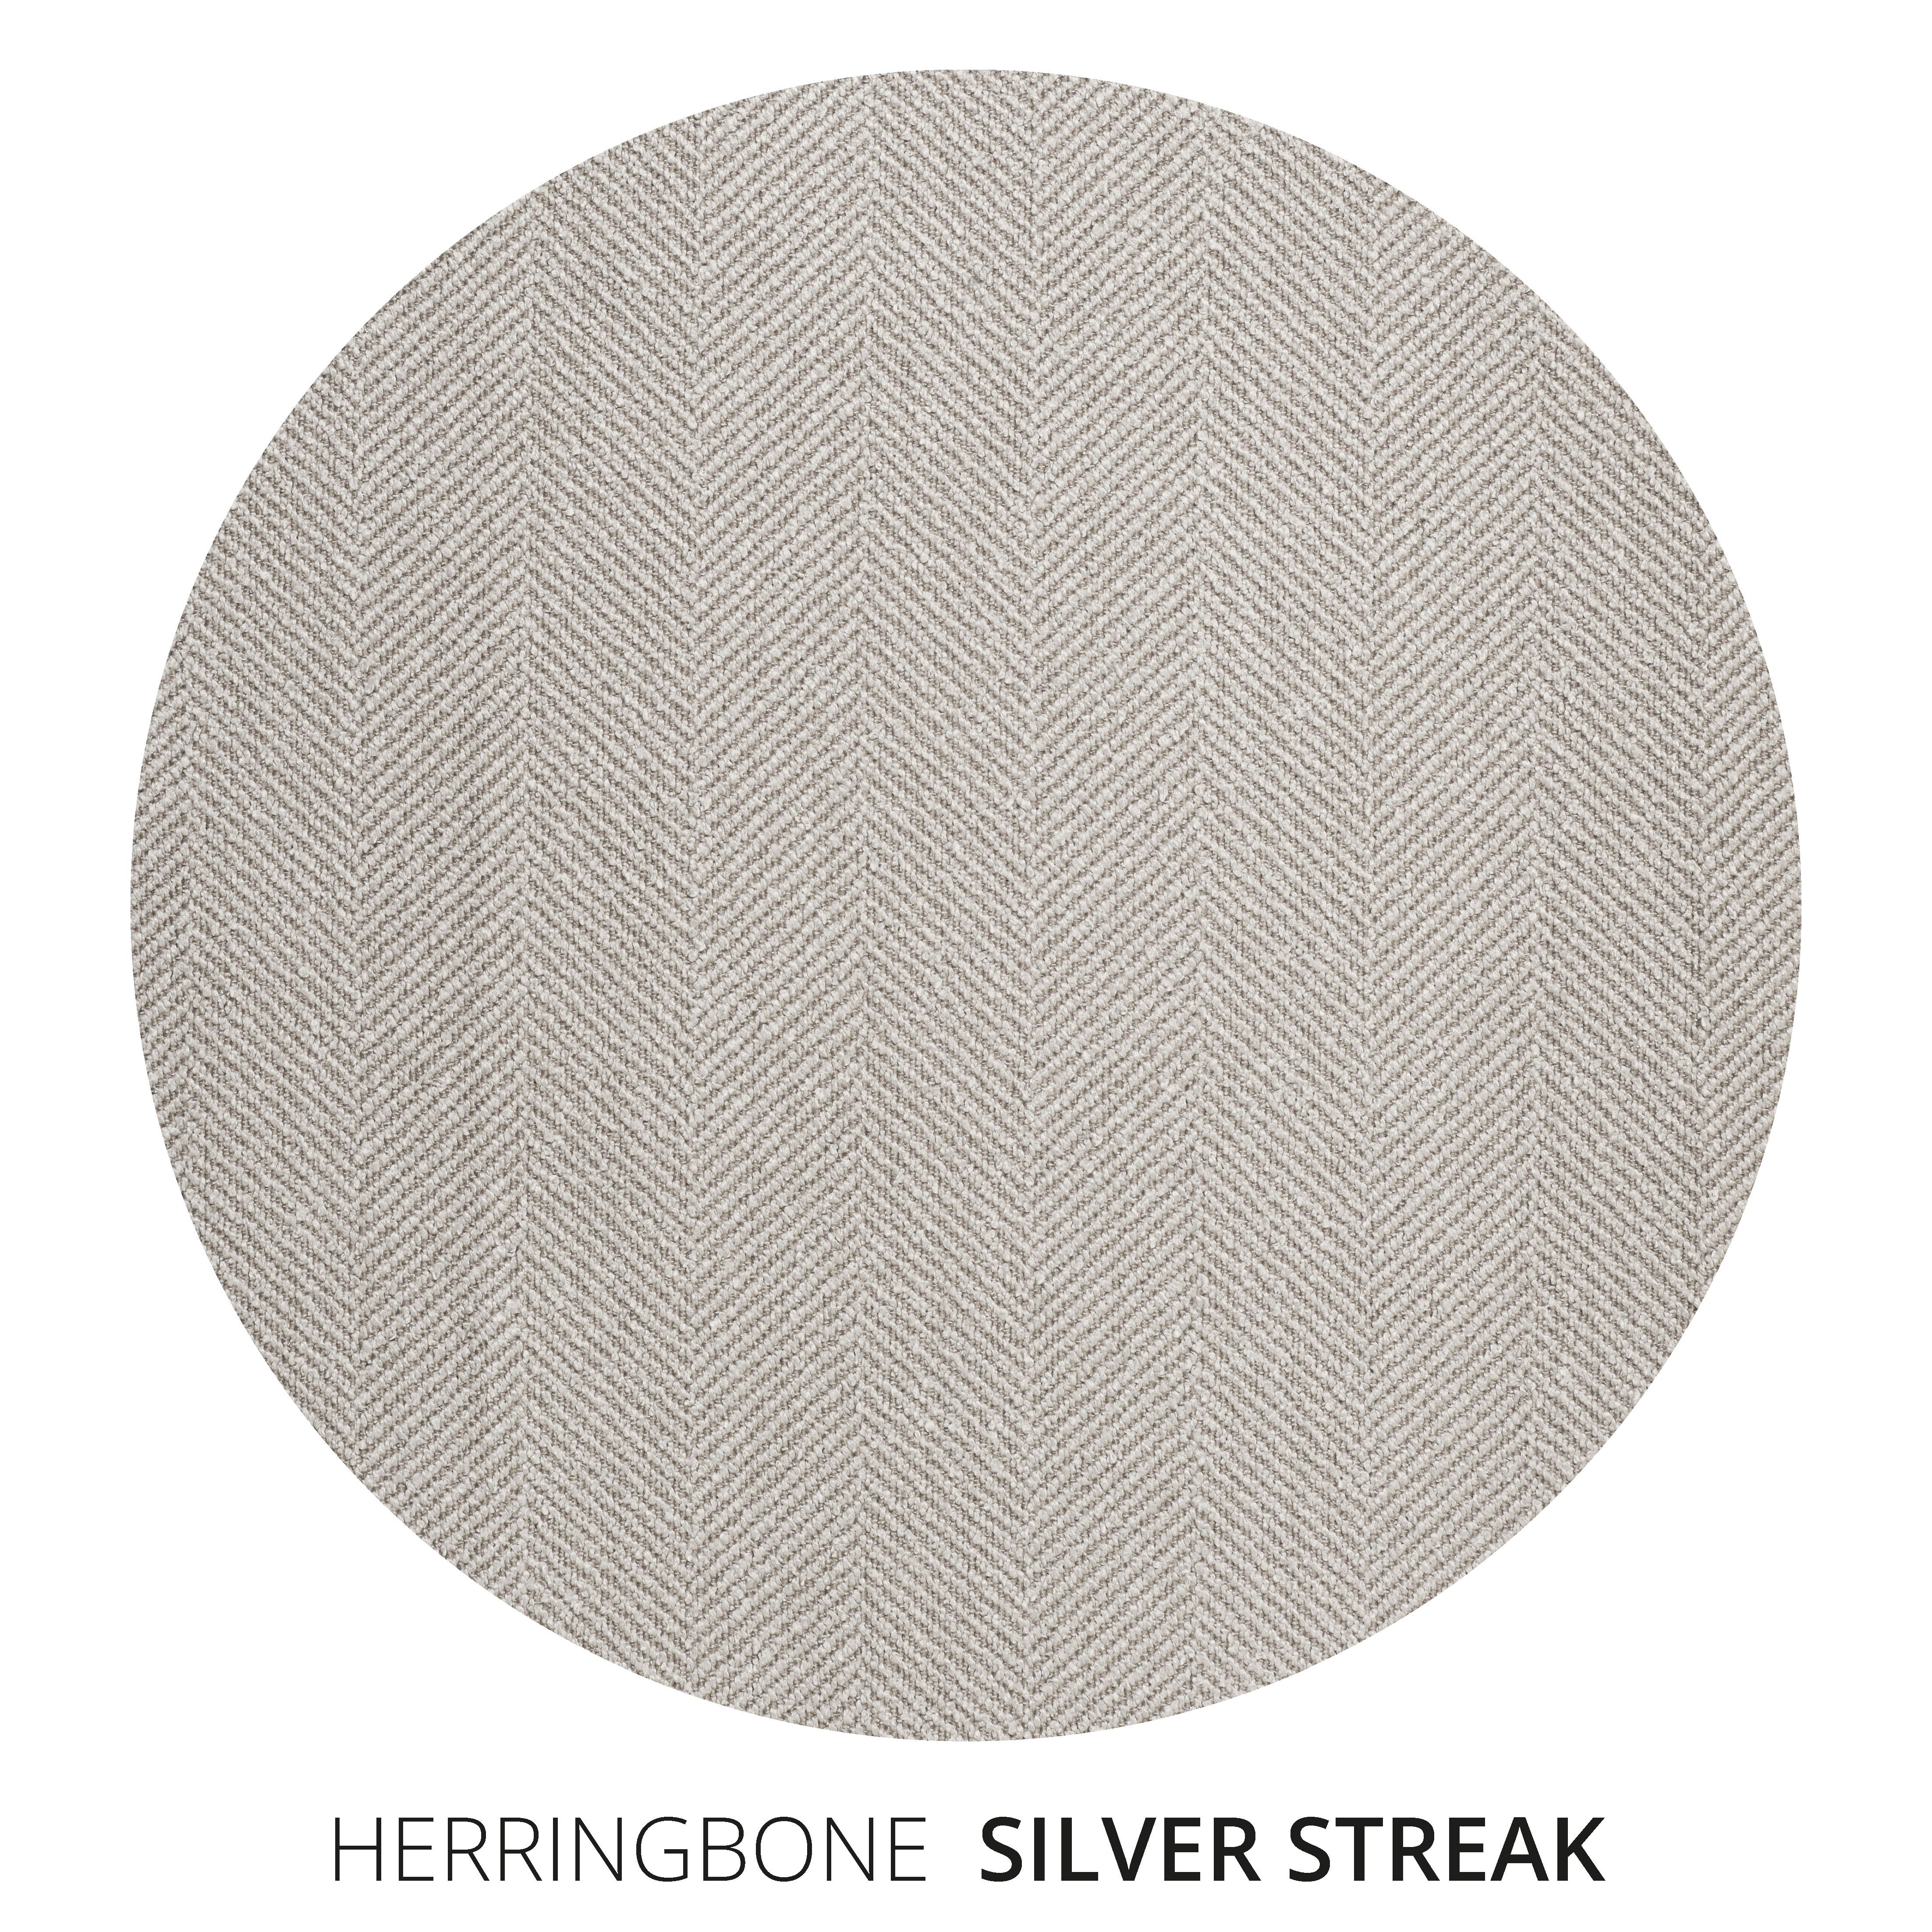 Silver Streak Herringbone Swatch